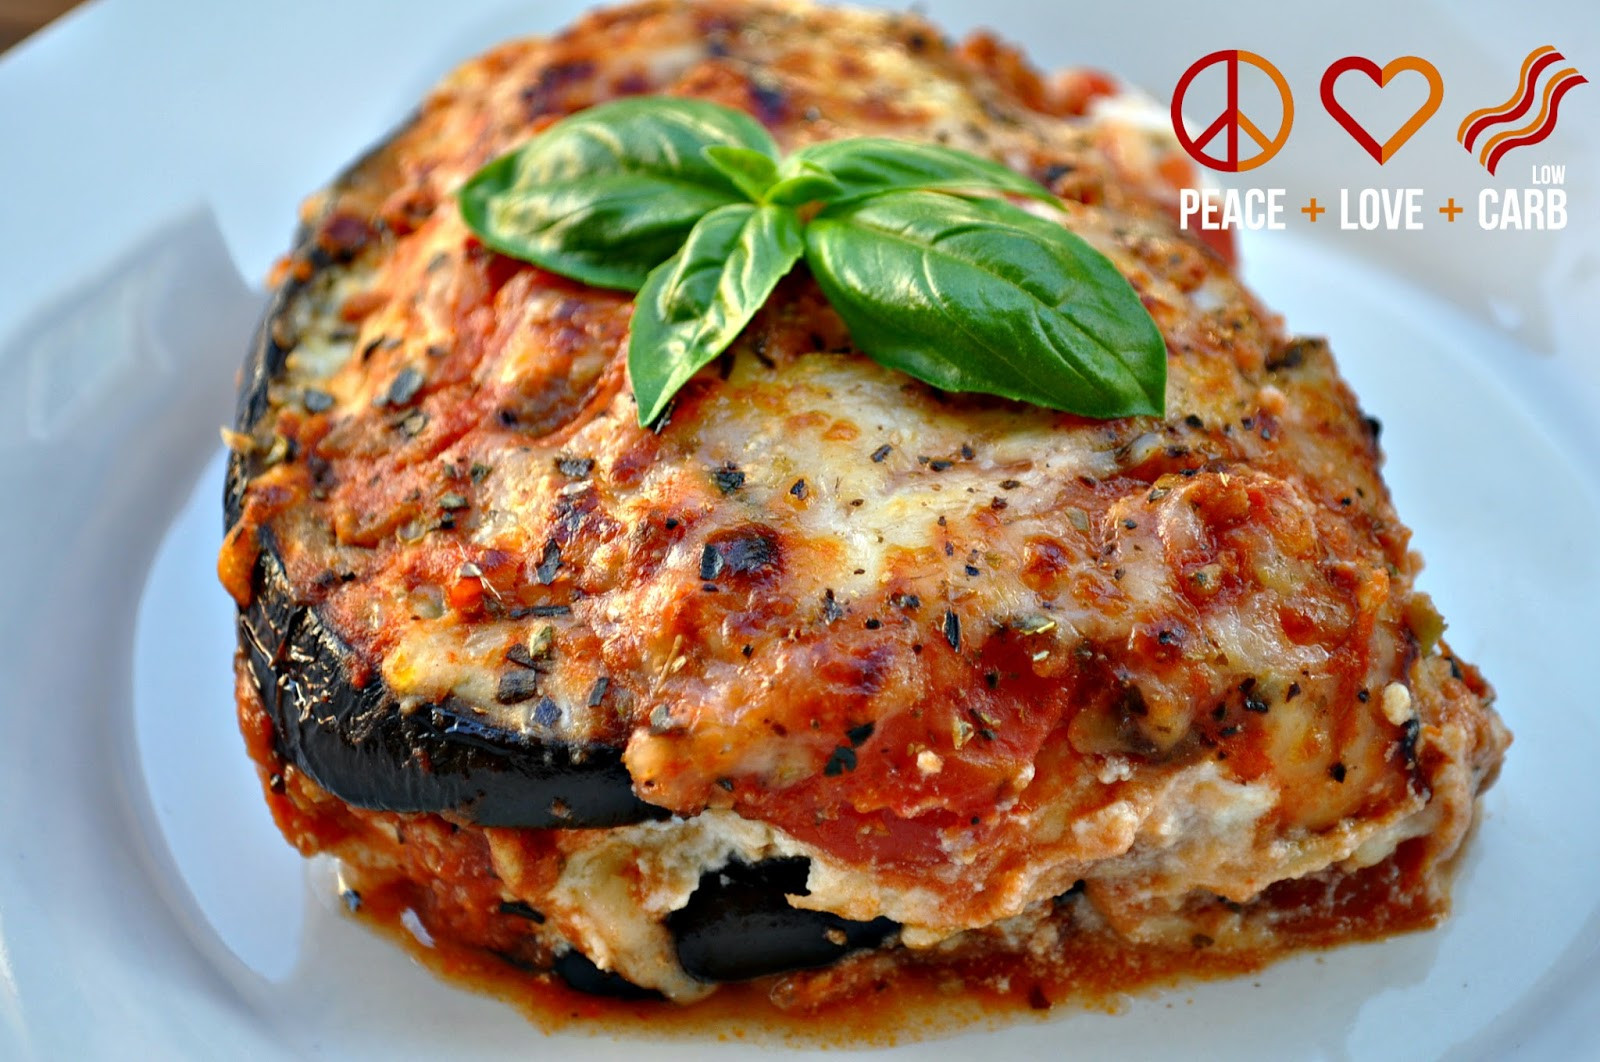 Low Carb Meat Recipes  Eggplant Lasagna with Meat Sauce Low Carb Lasagna